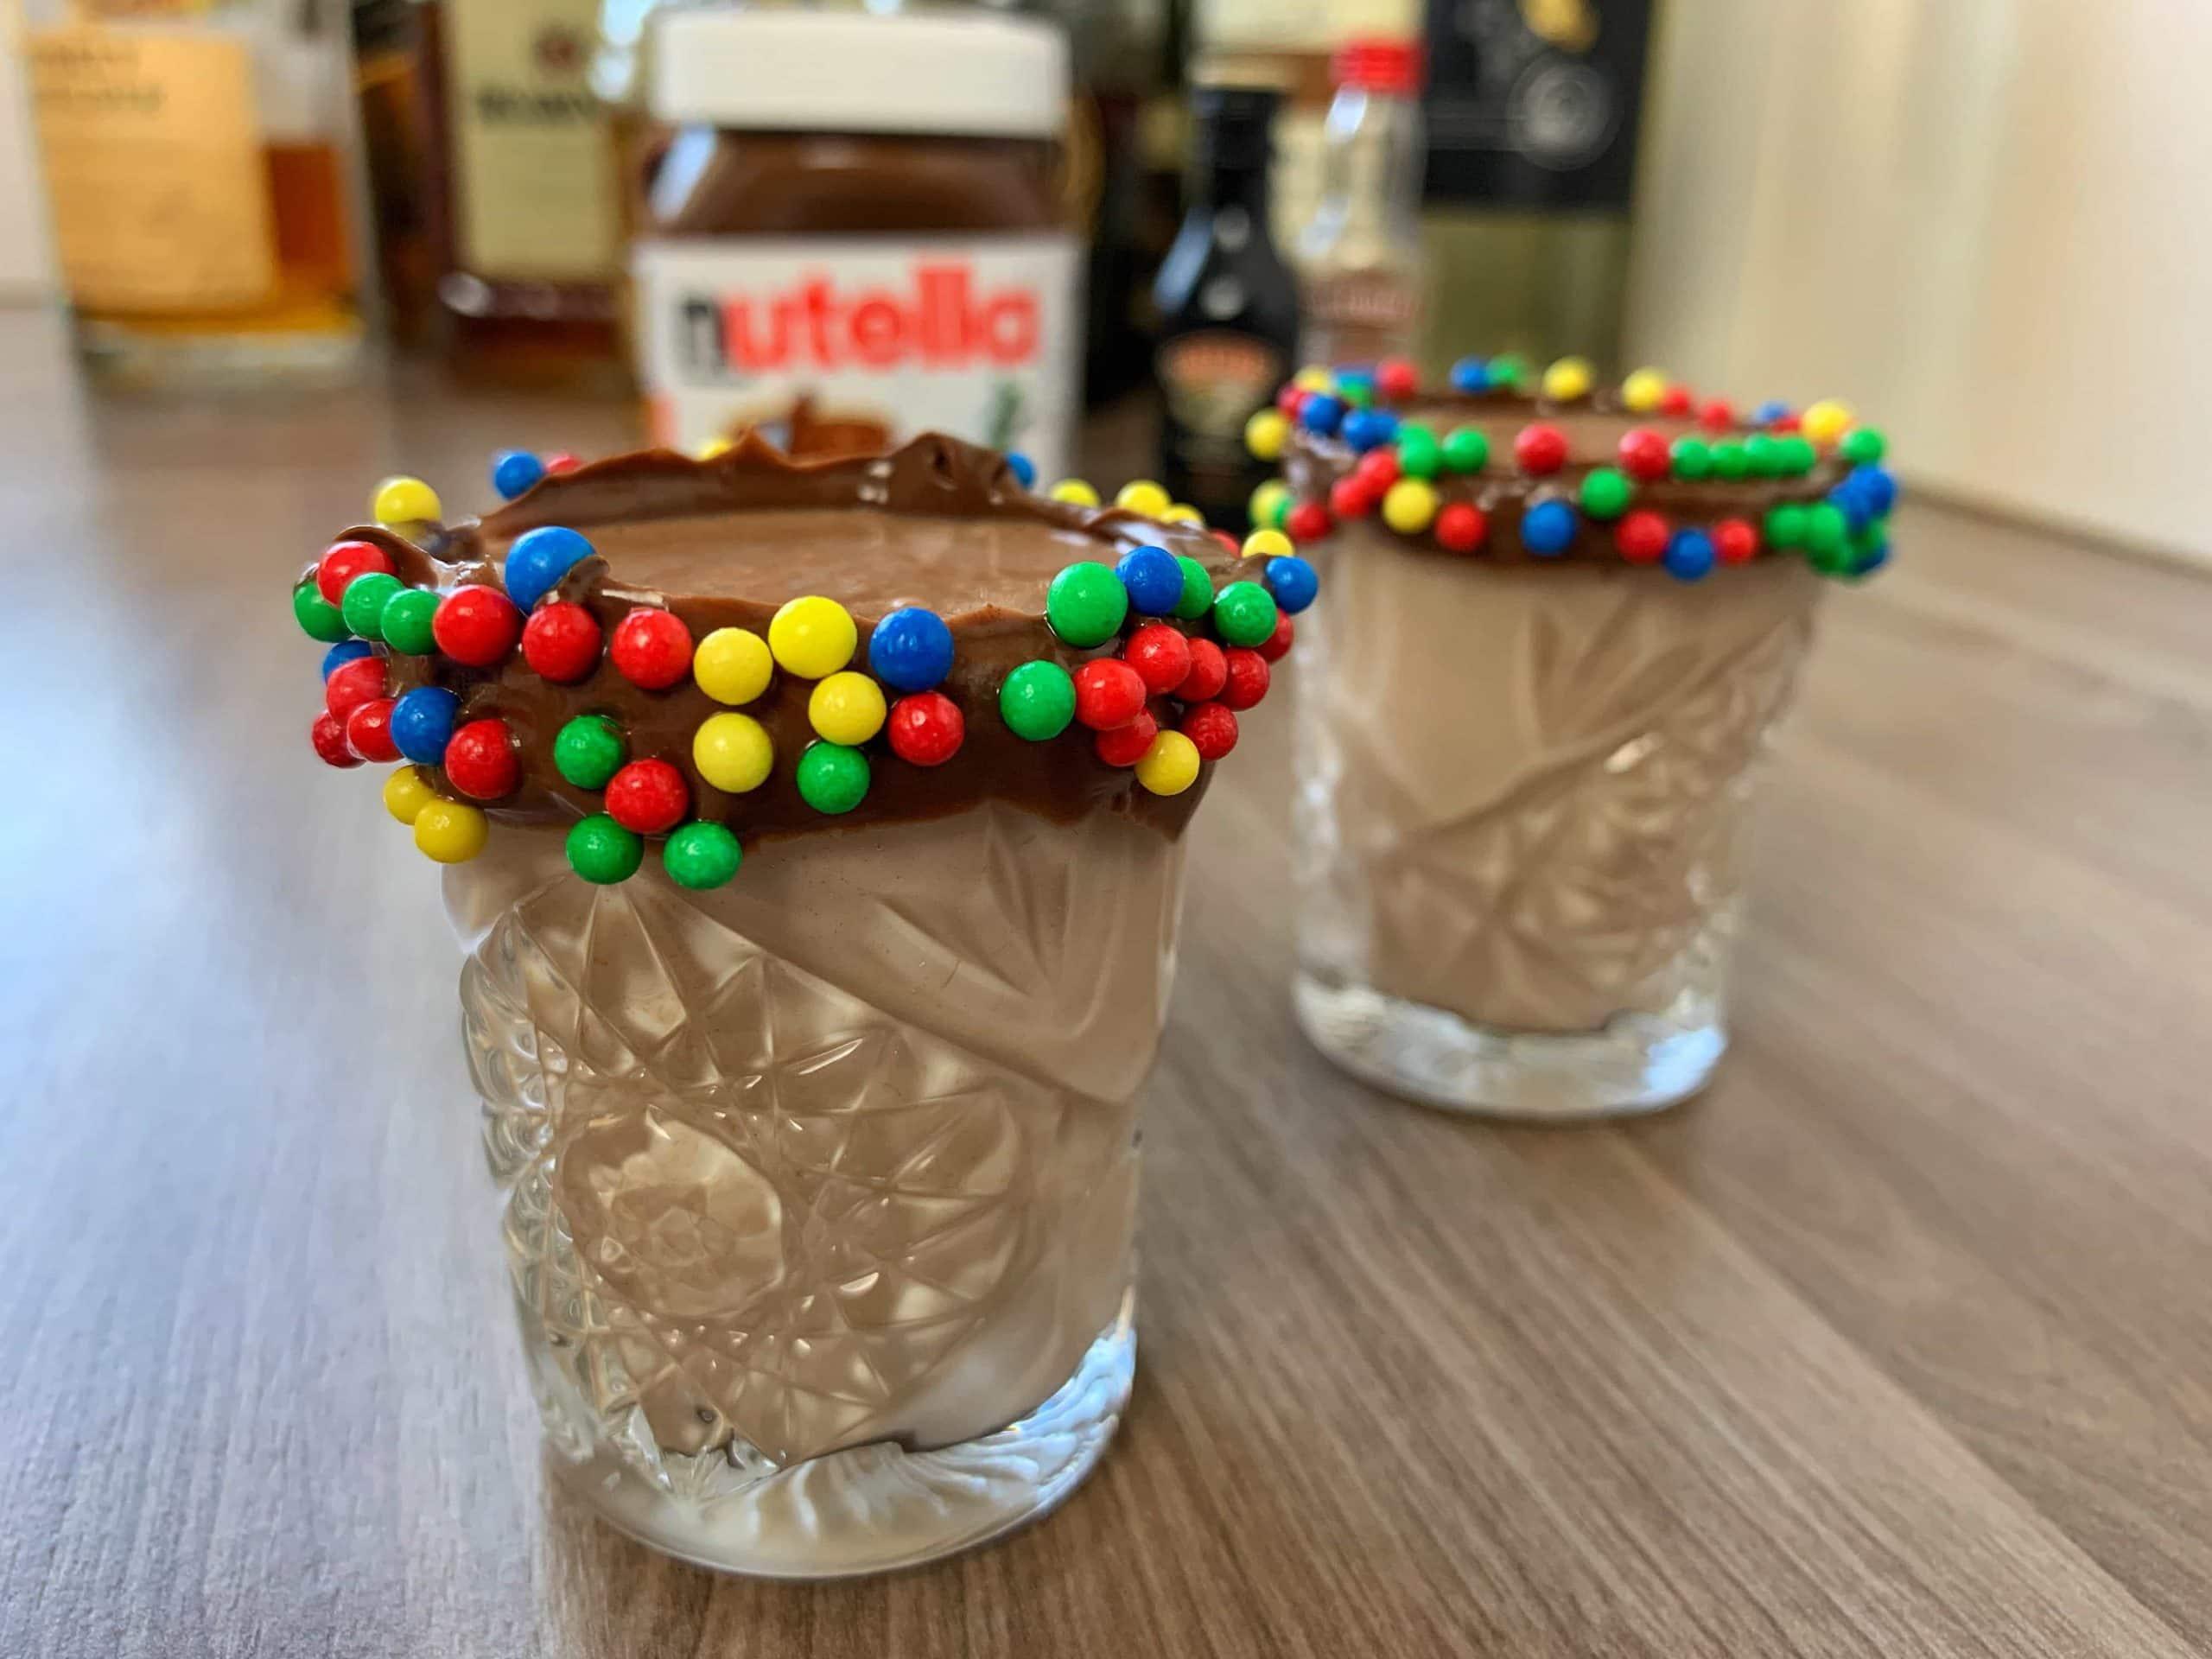 Nutella Shots